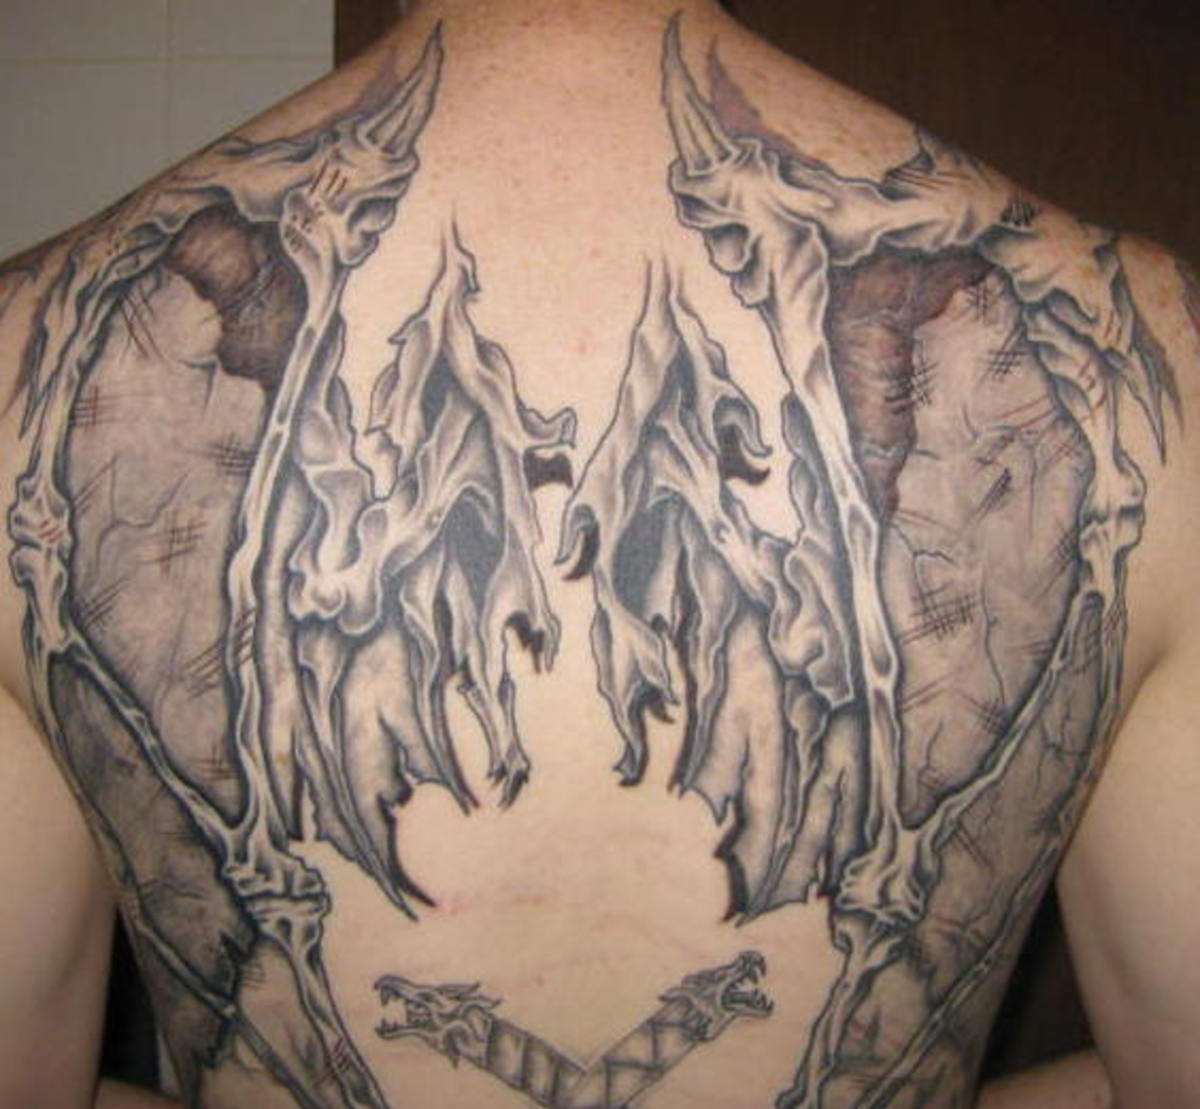 Shredded, Skeletal Wing Tattoo